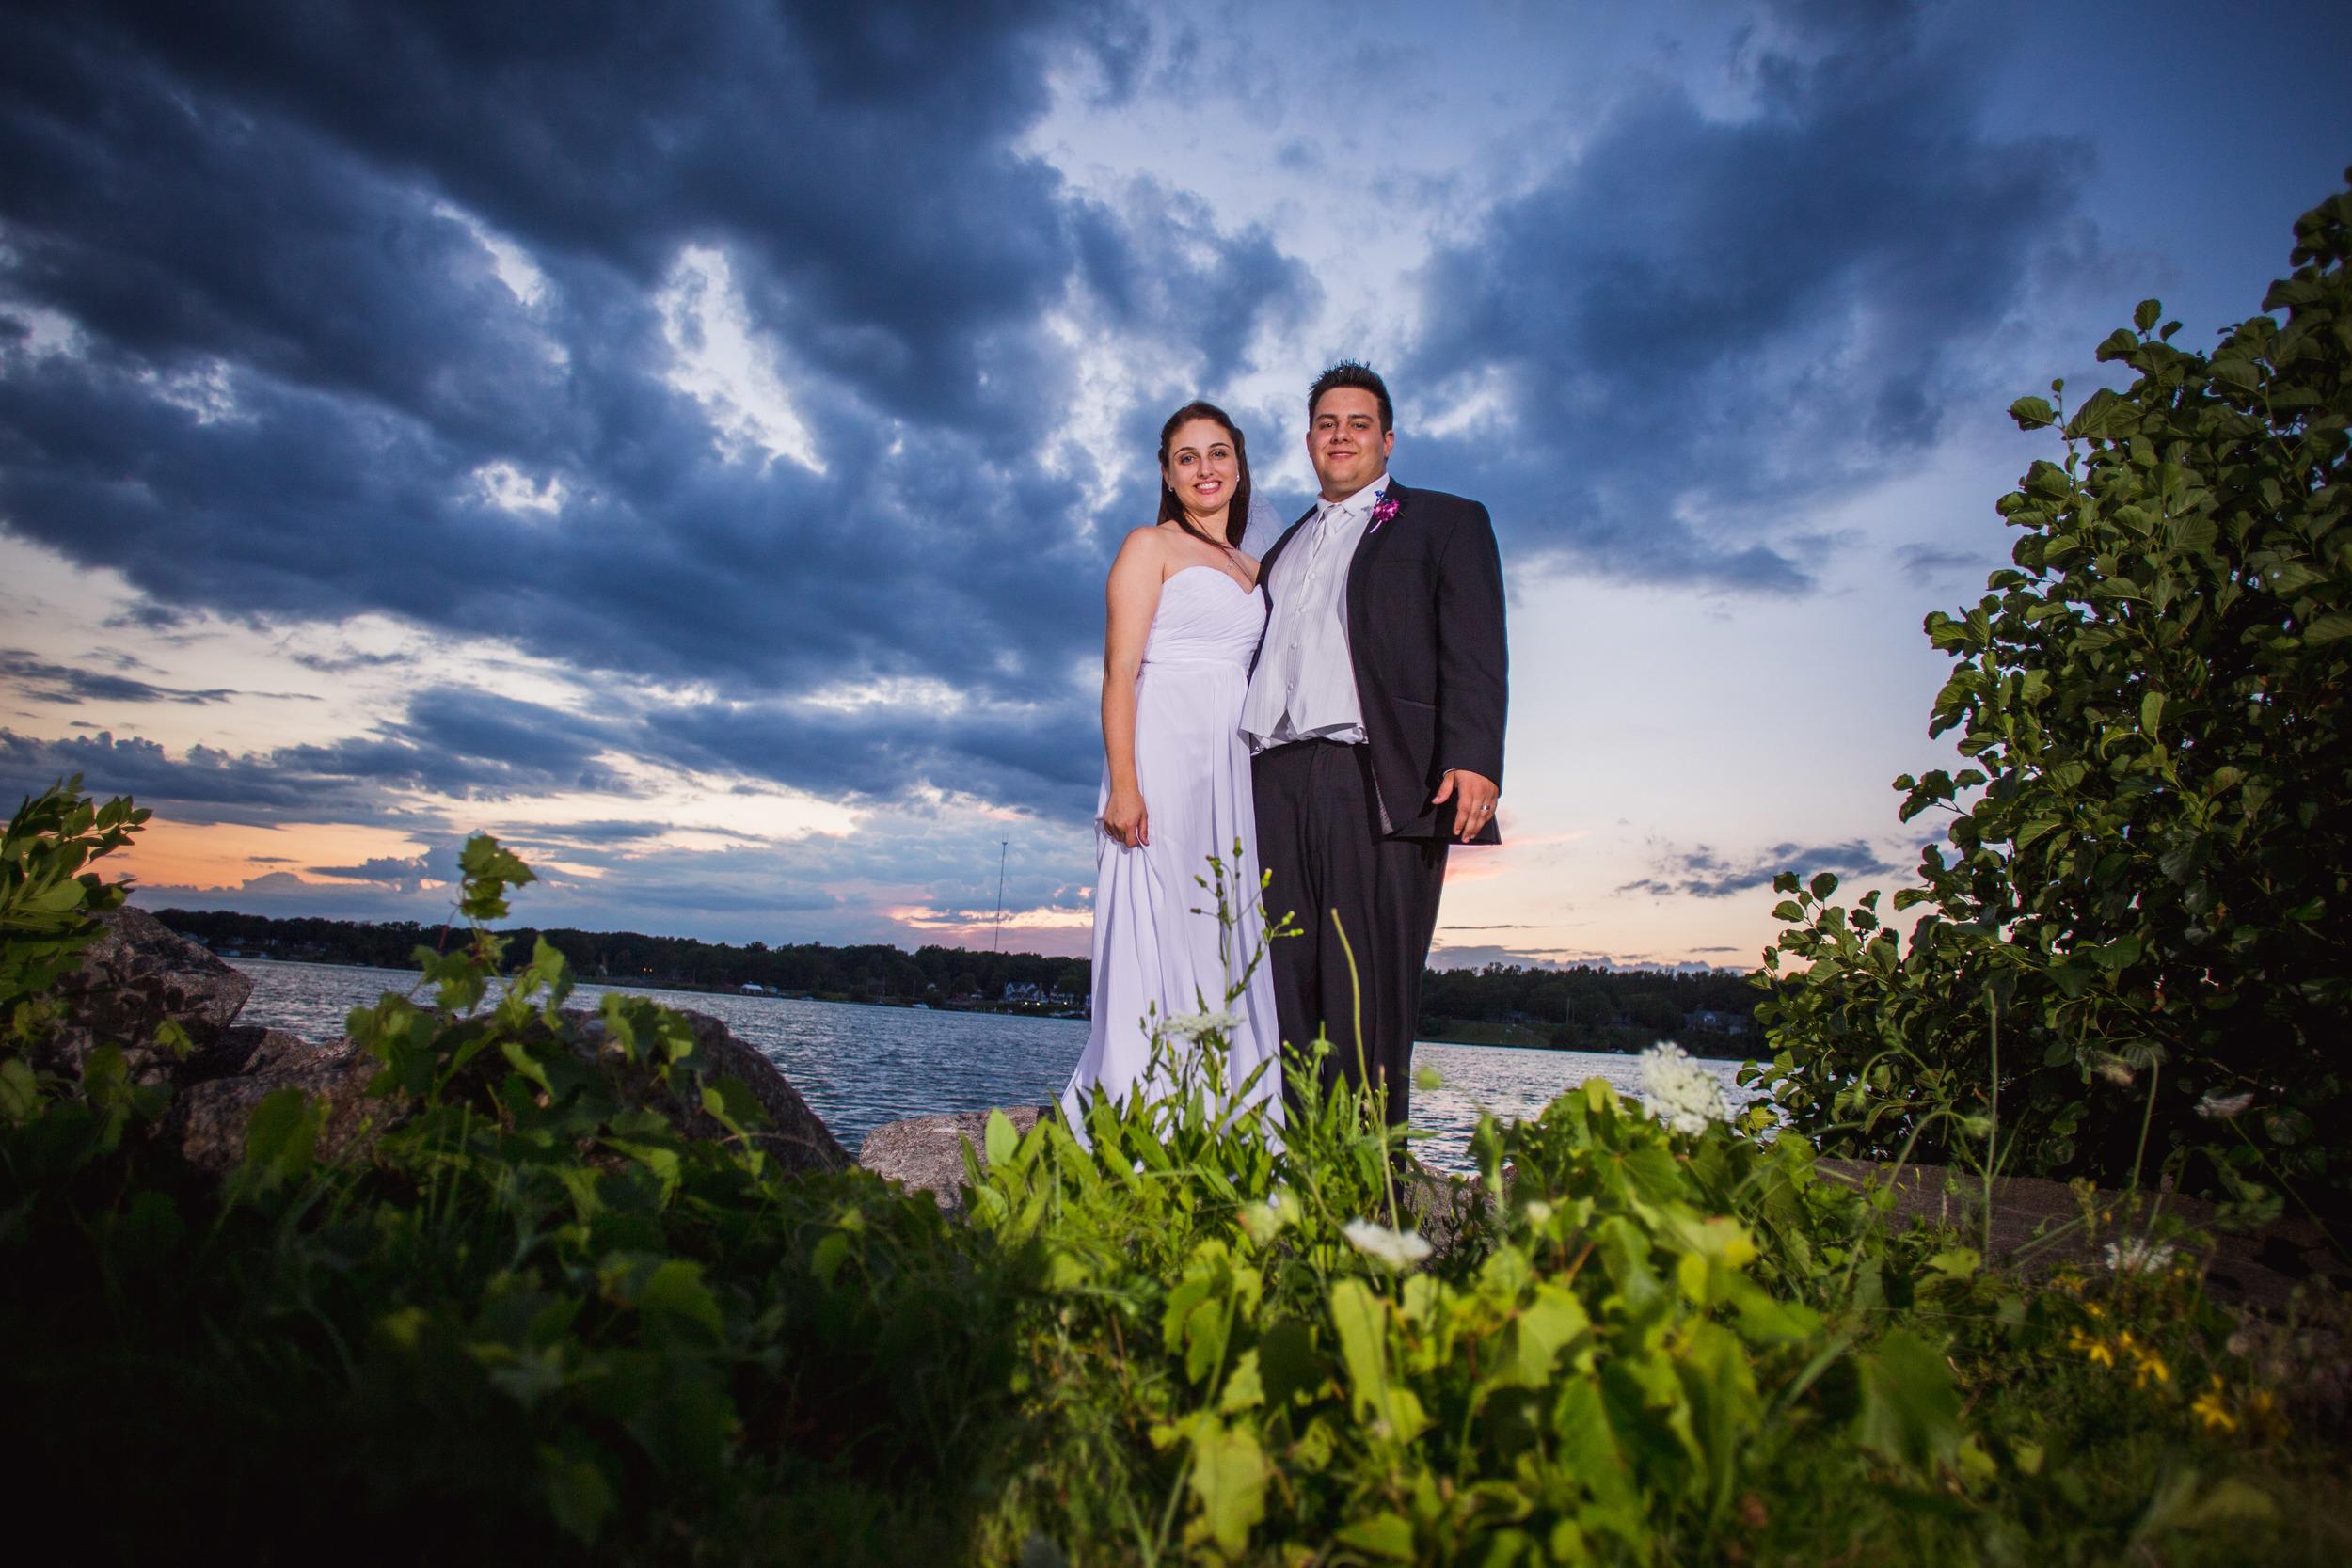 Stephanie-and-Mitchell-Buffalo-NY-Wedding-Stefan-Ludwig-Photography-226.jpg